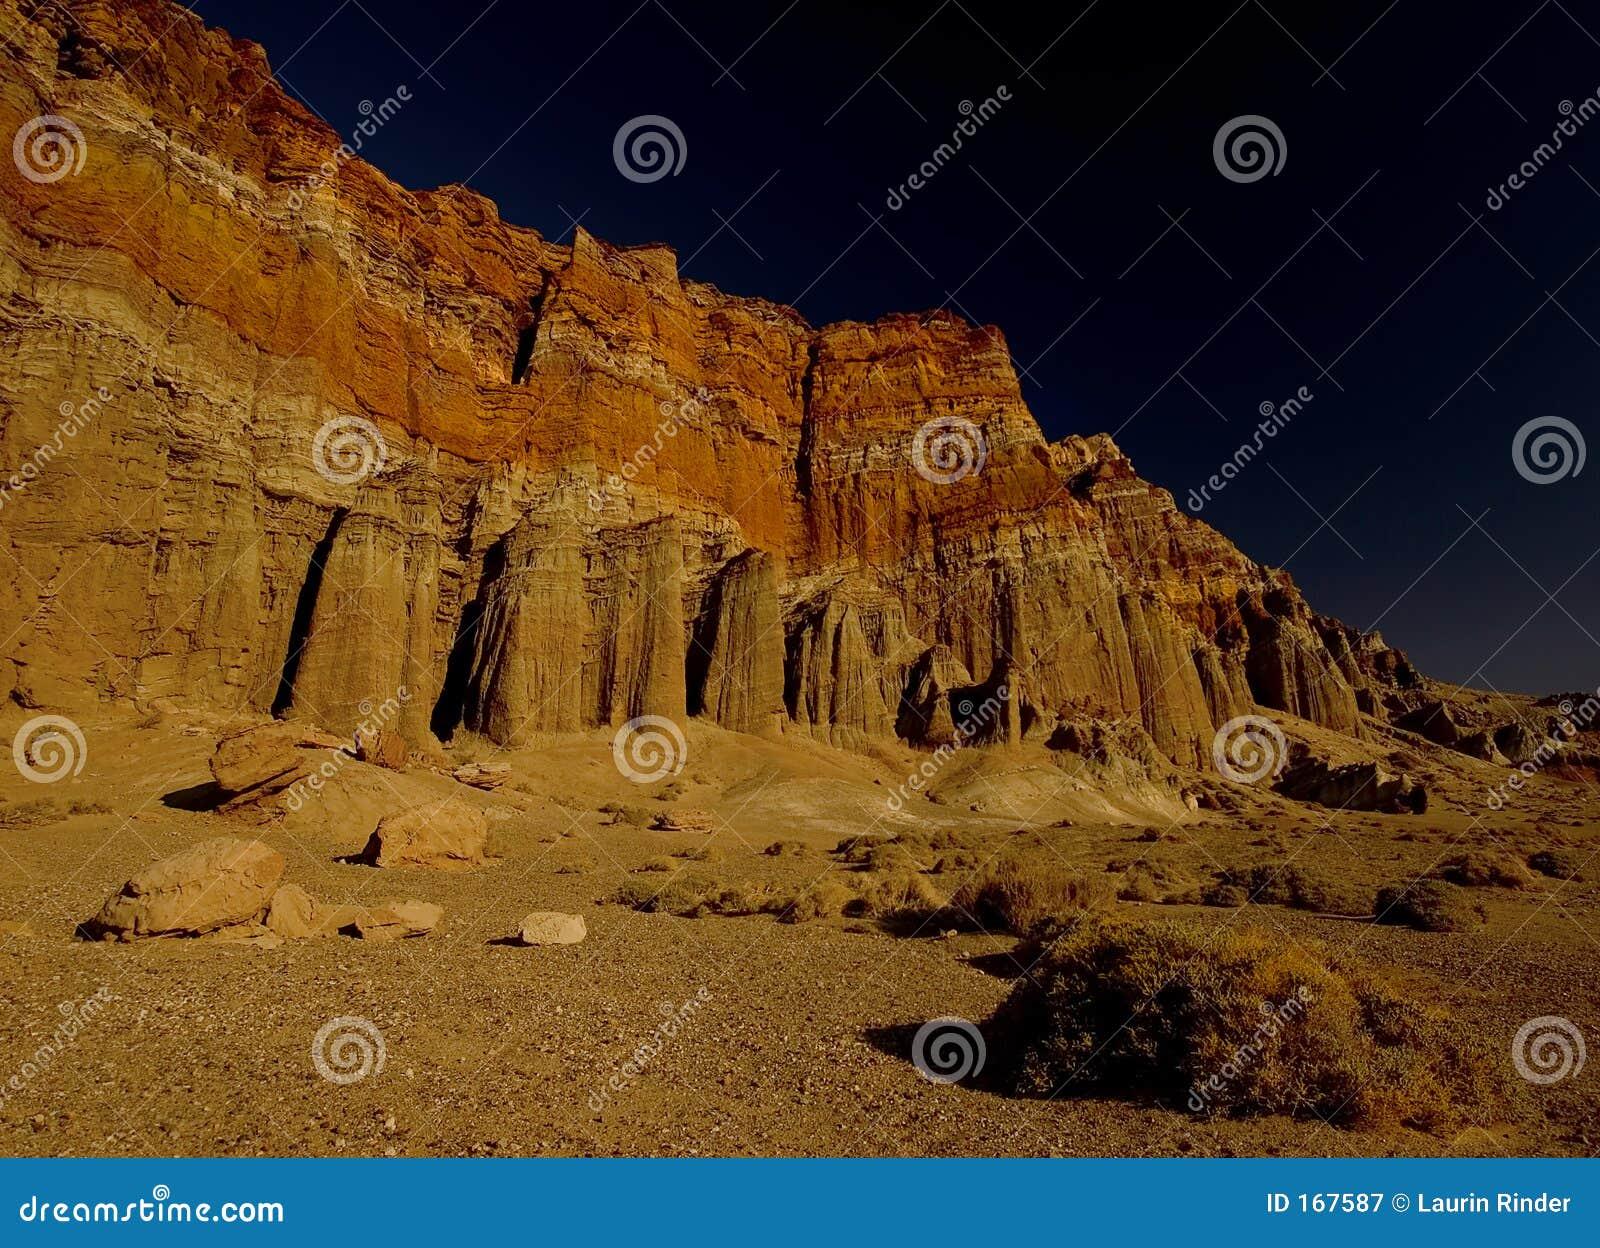 2 Death Valley